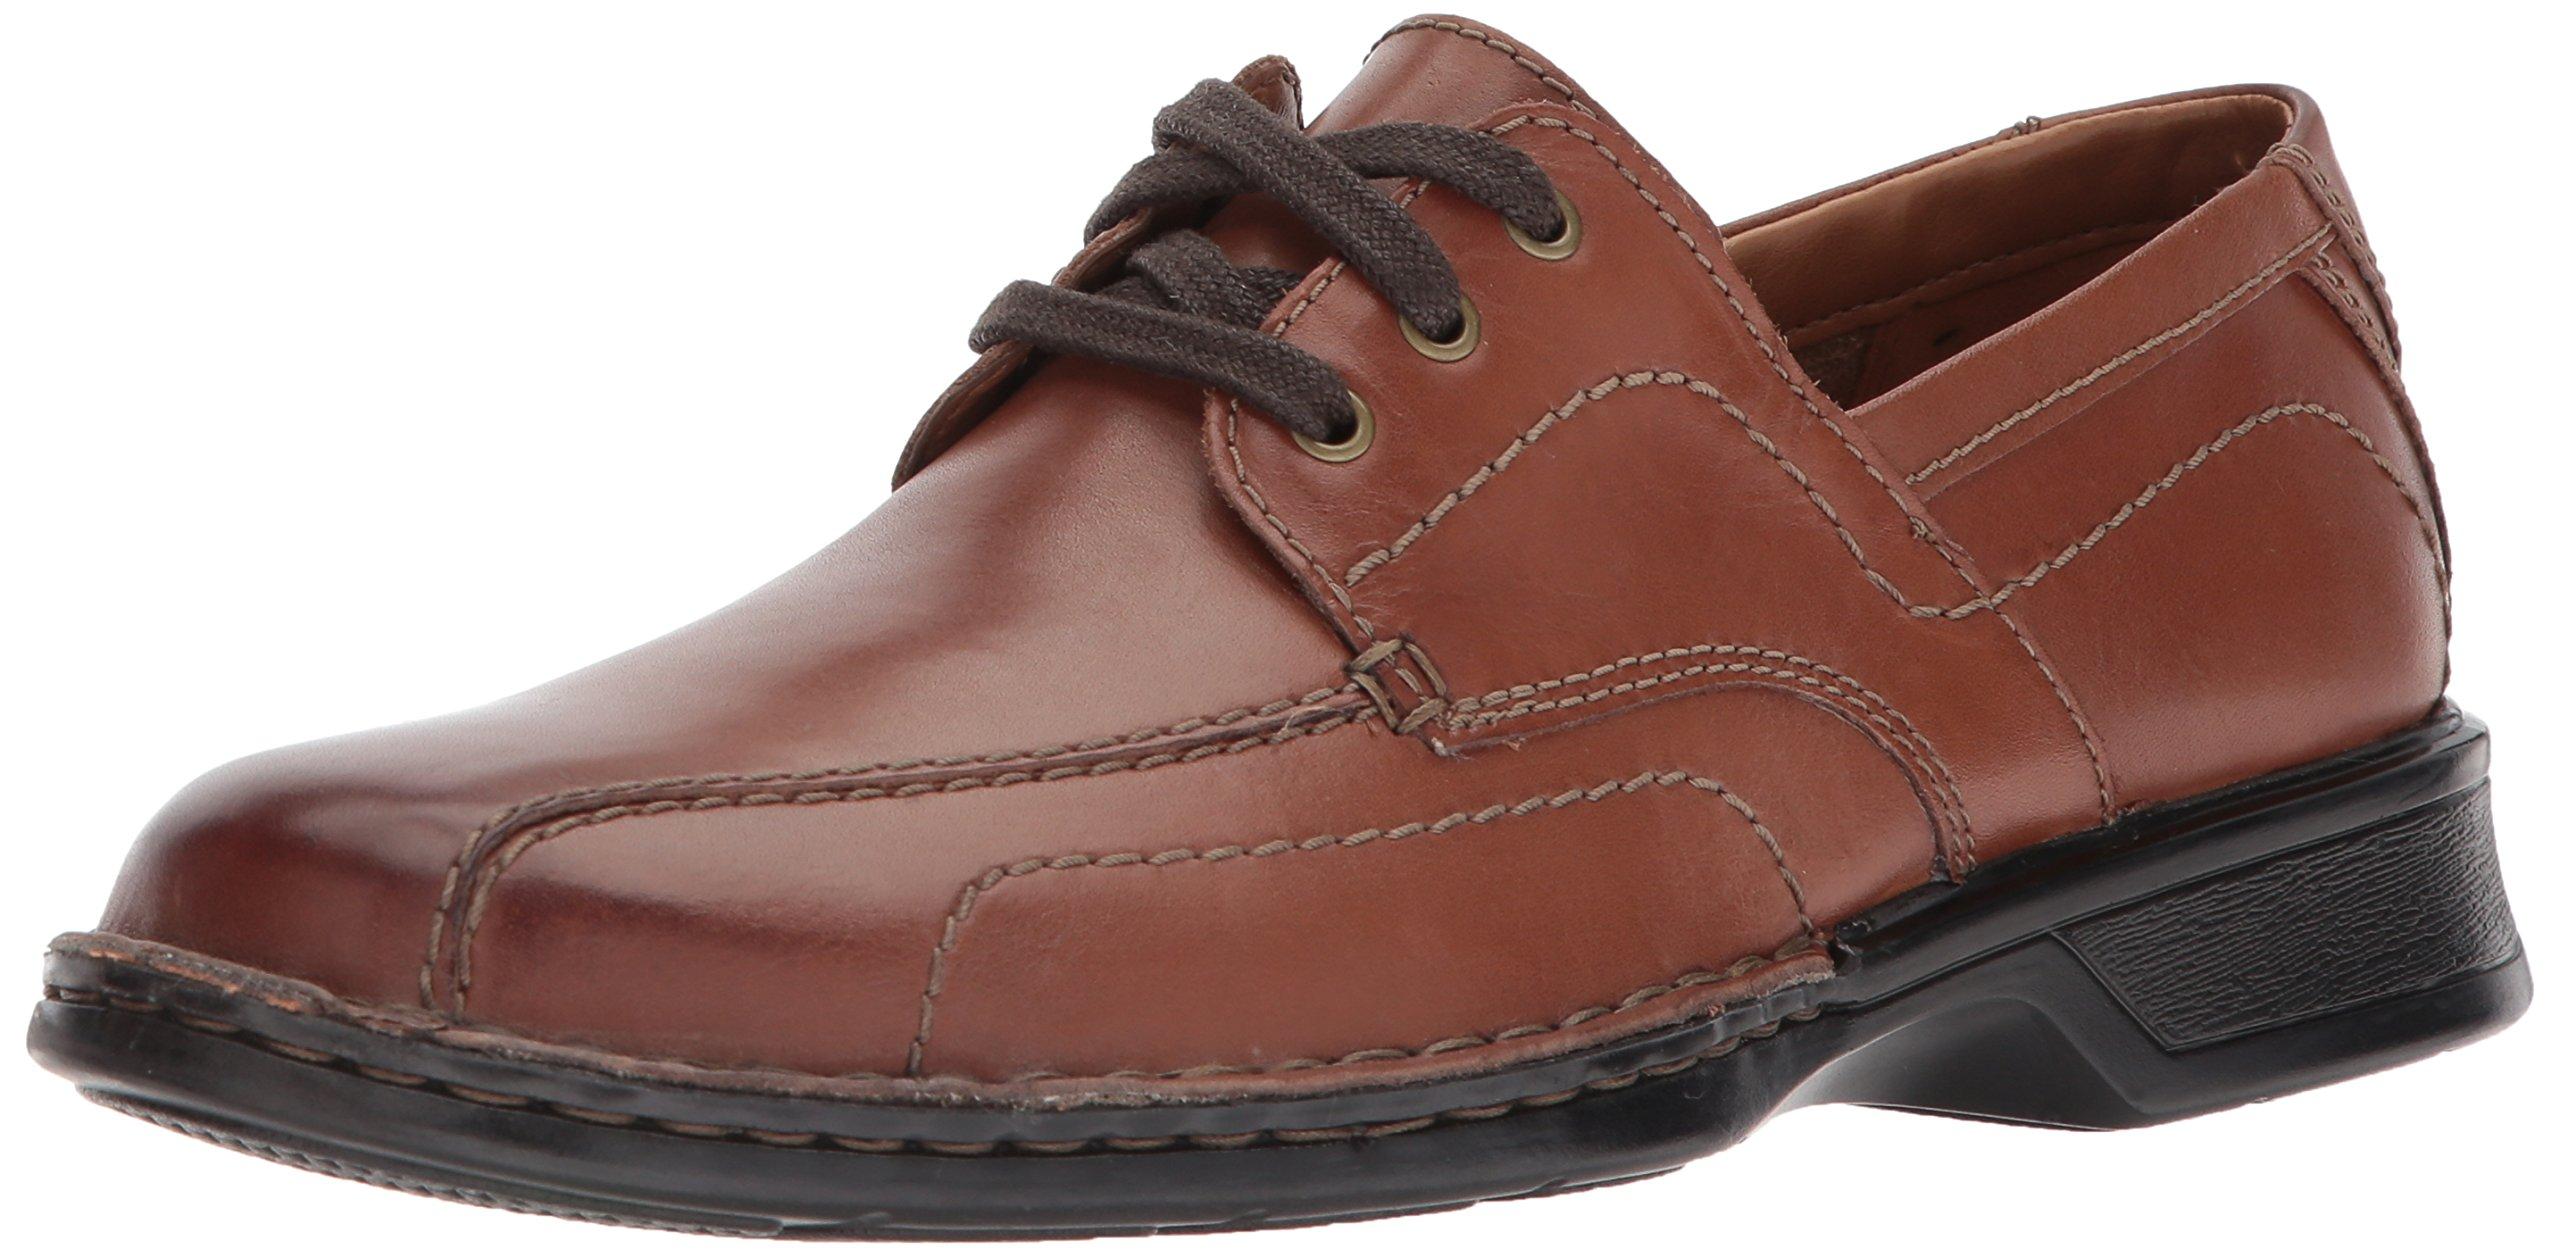 Clarks Men's Northam Edge Shoe, brown leather, 13 Wide US